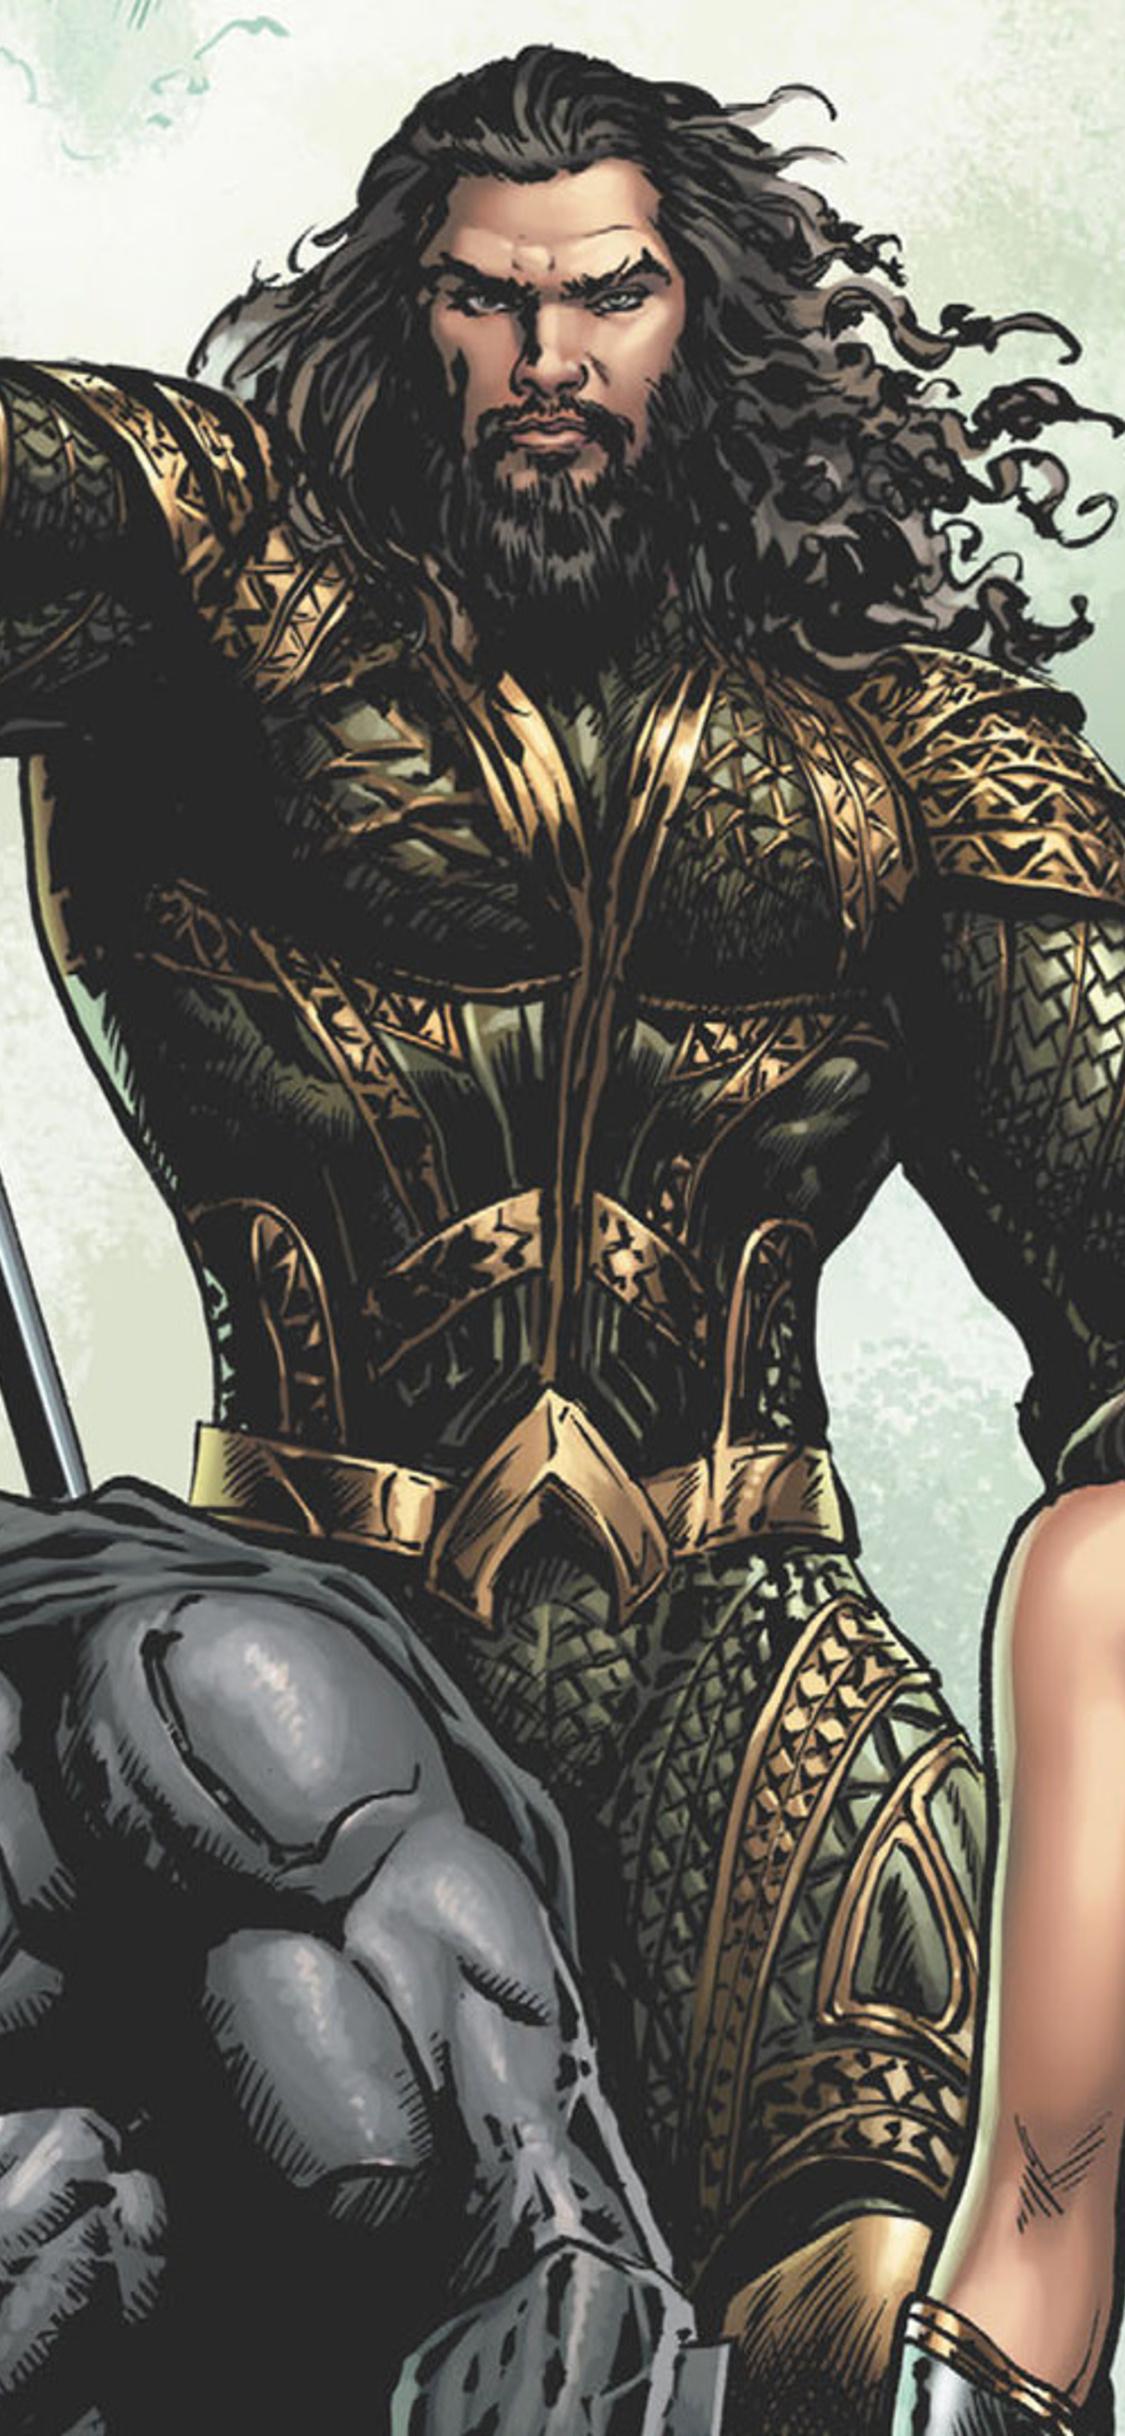 1125x2436 Justice League Aquaman Batman Wonder Woman Artwork Iphone